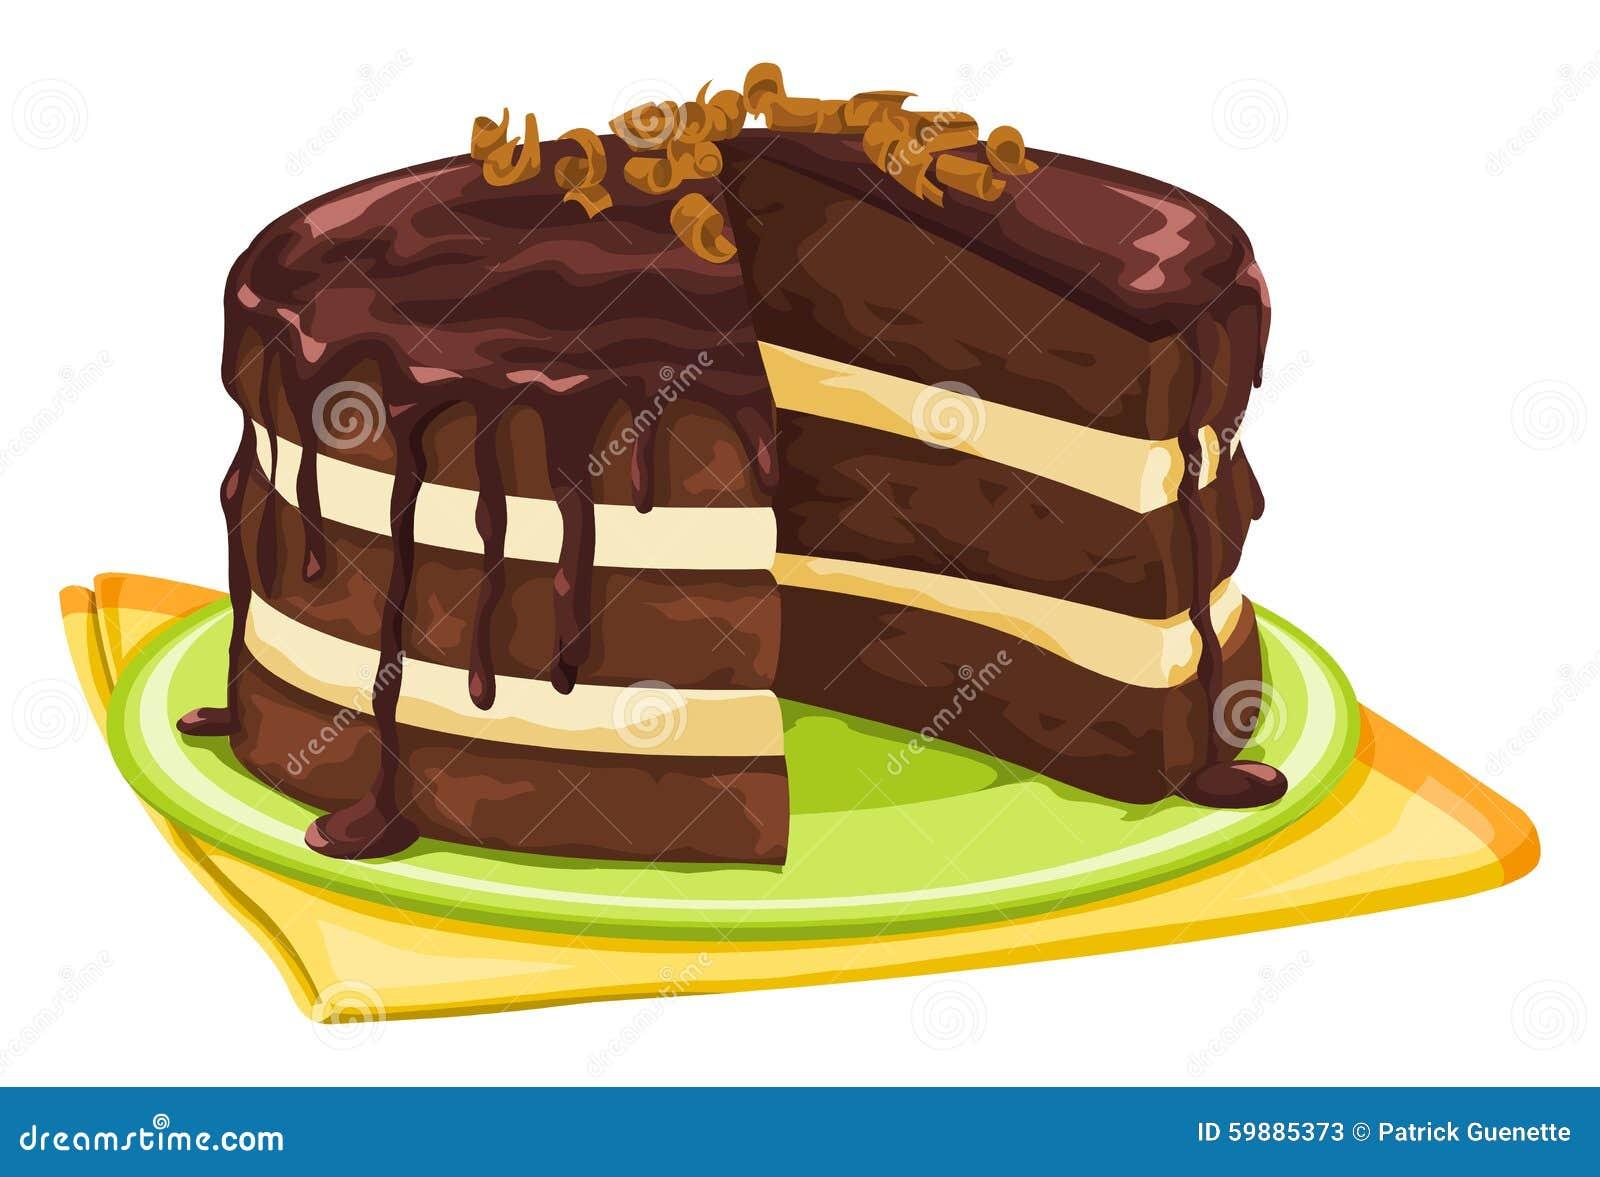 Clip Art Chocolate Cake Clipart chocolate cake clipart vodagent com clip art vodagent